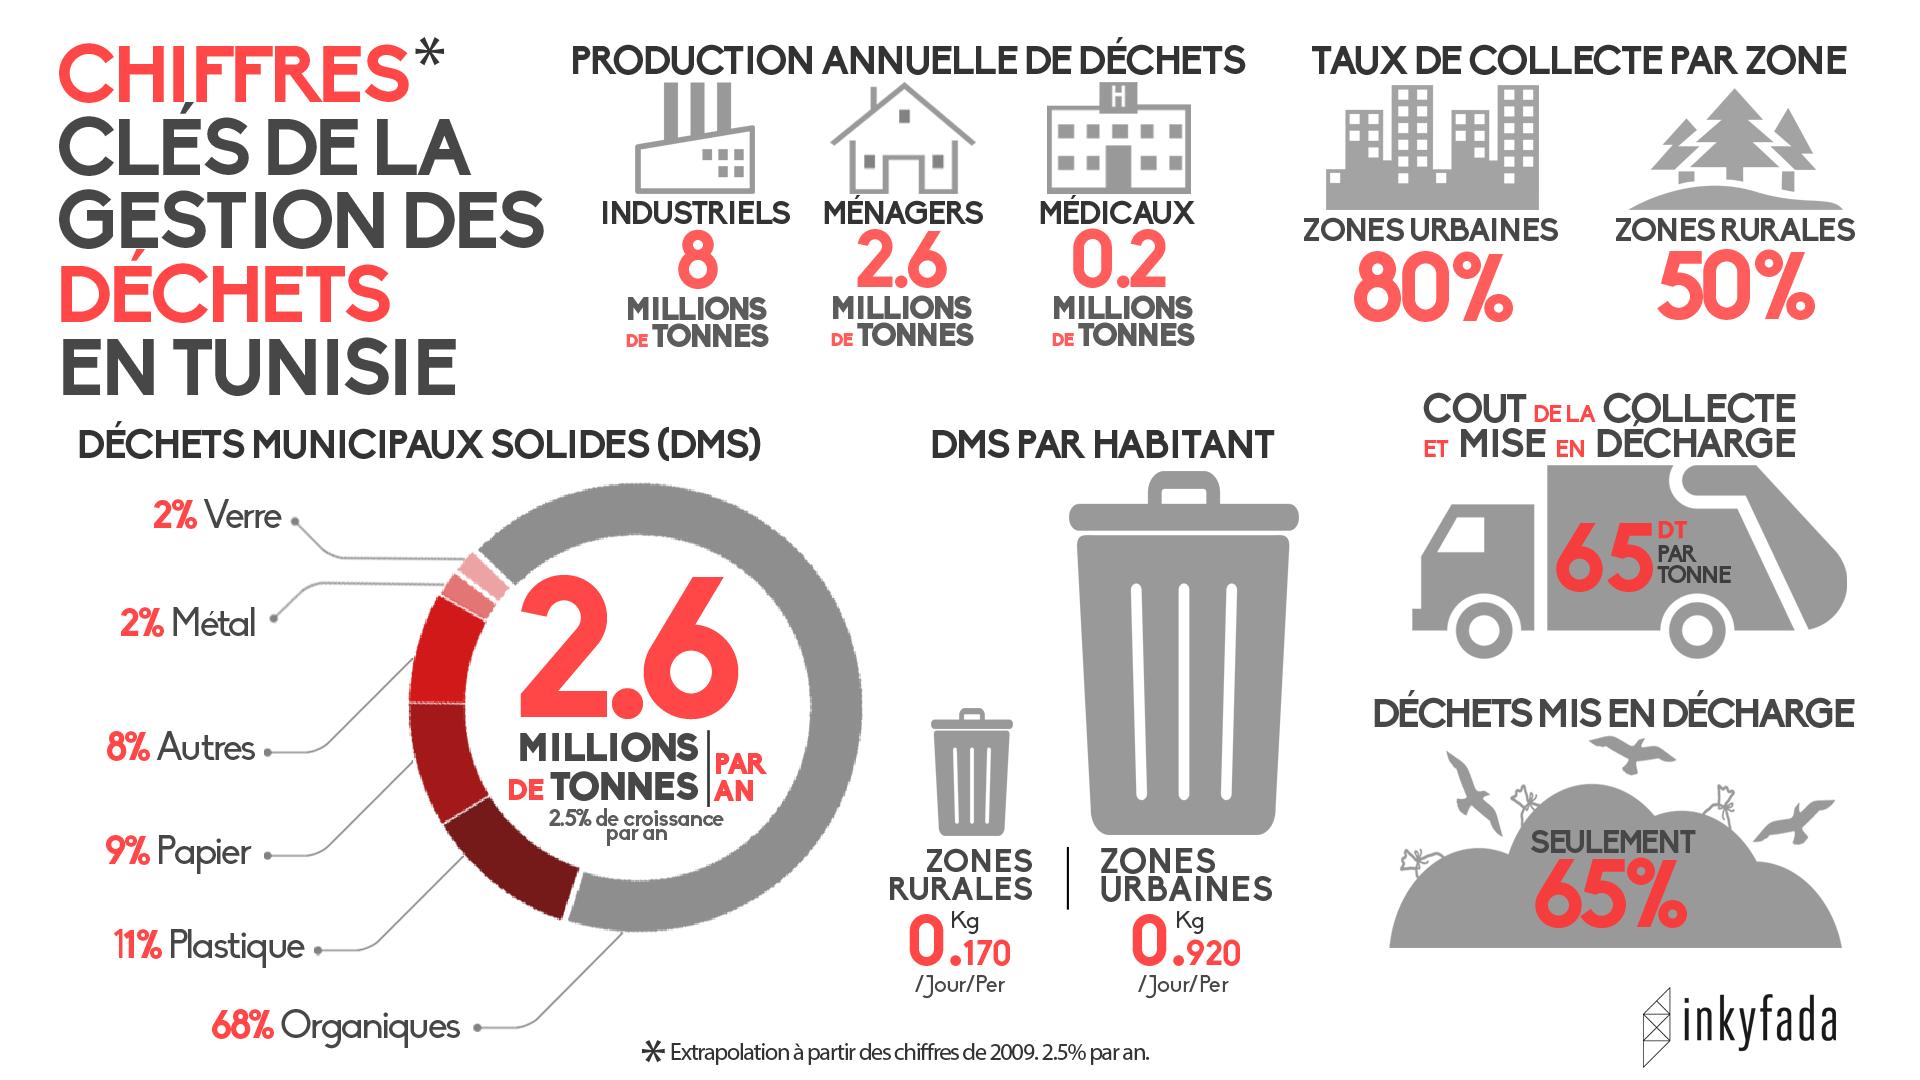 infographie-interdiction-sacs-plastiques-dechets-tunisie-inkyfada